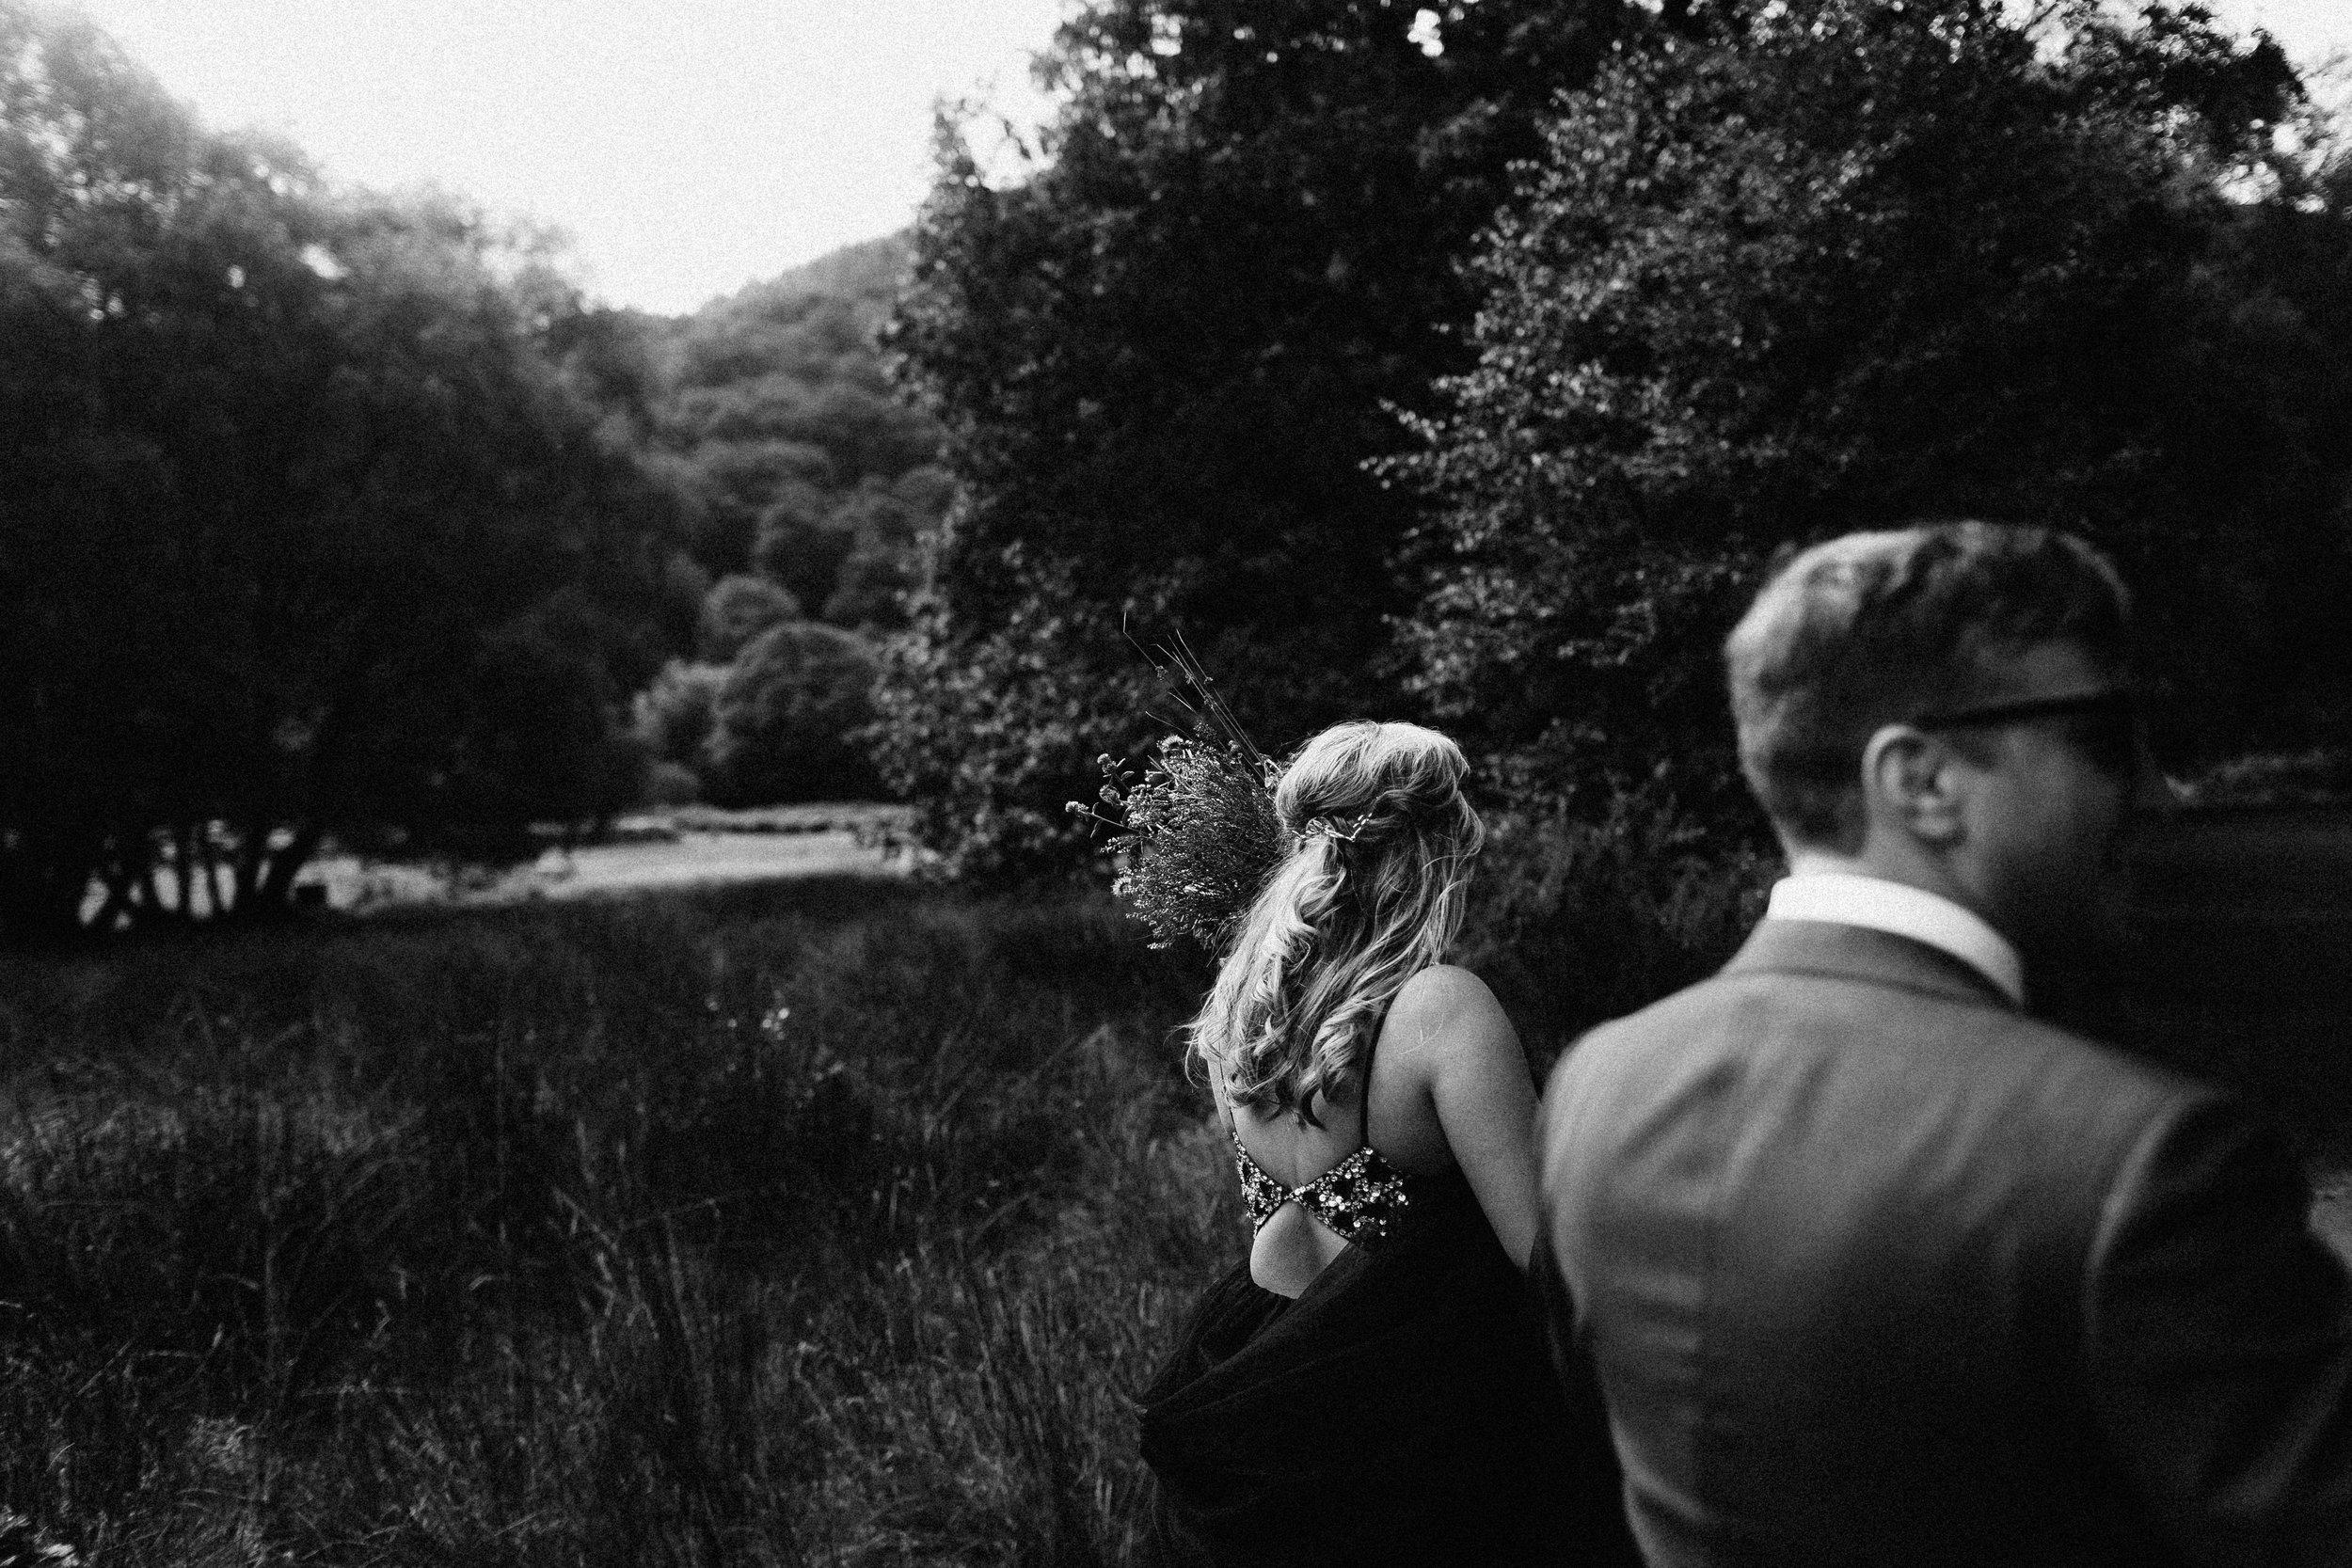 ireland_elopement_black_wedding_dress_wicklow_glendalough_athy_st_kevins_way_1404.jpg